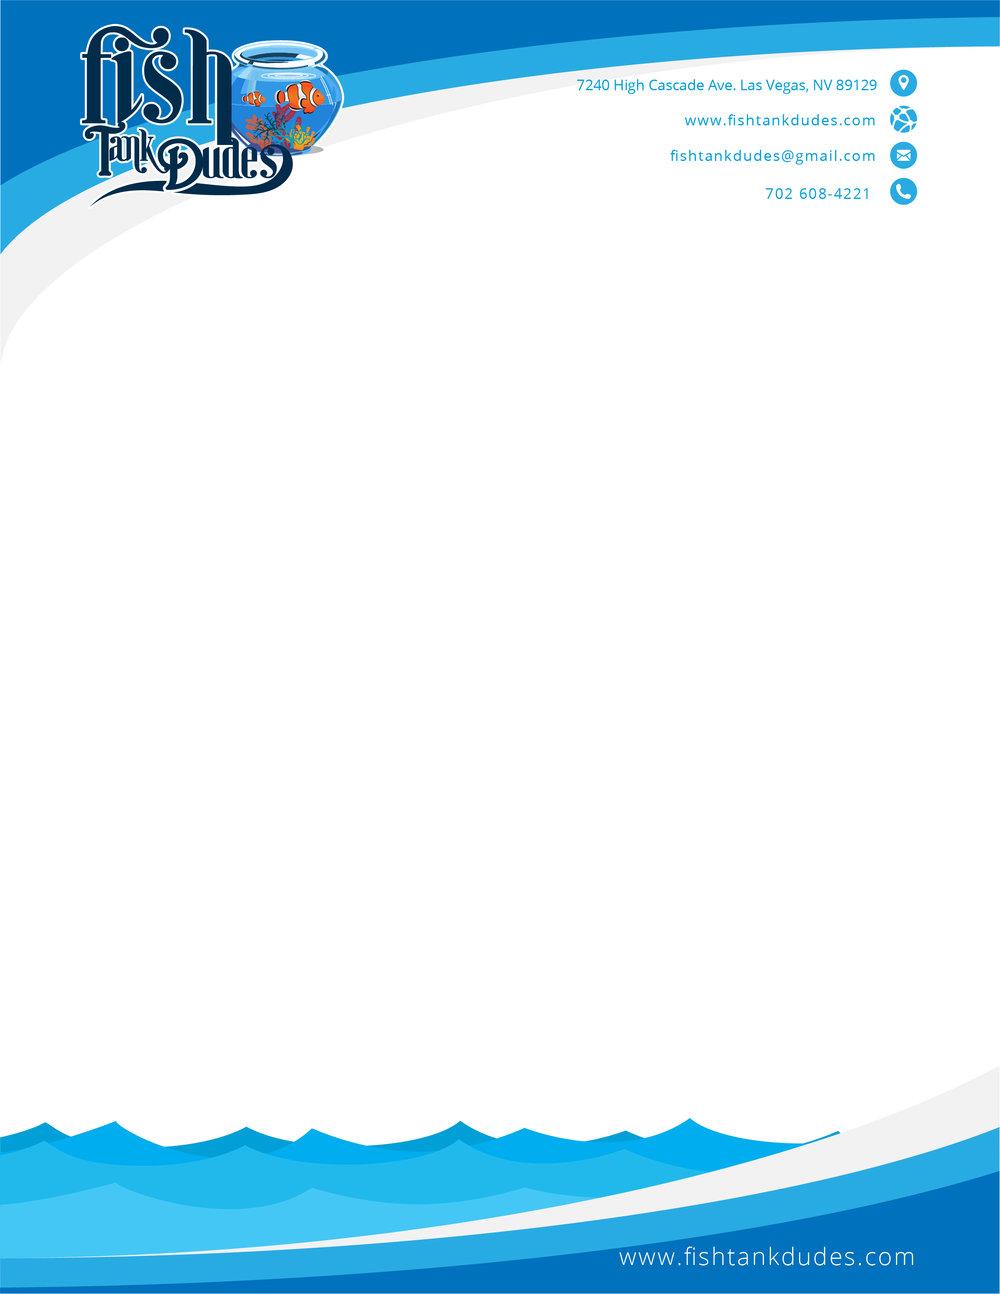 fish-letterhead2@4x-100.jpg